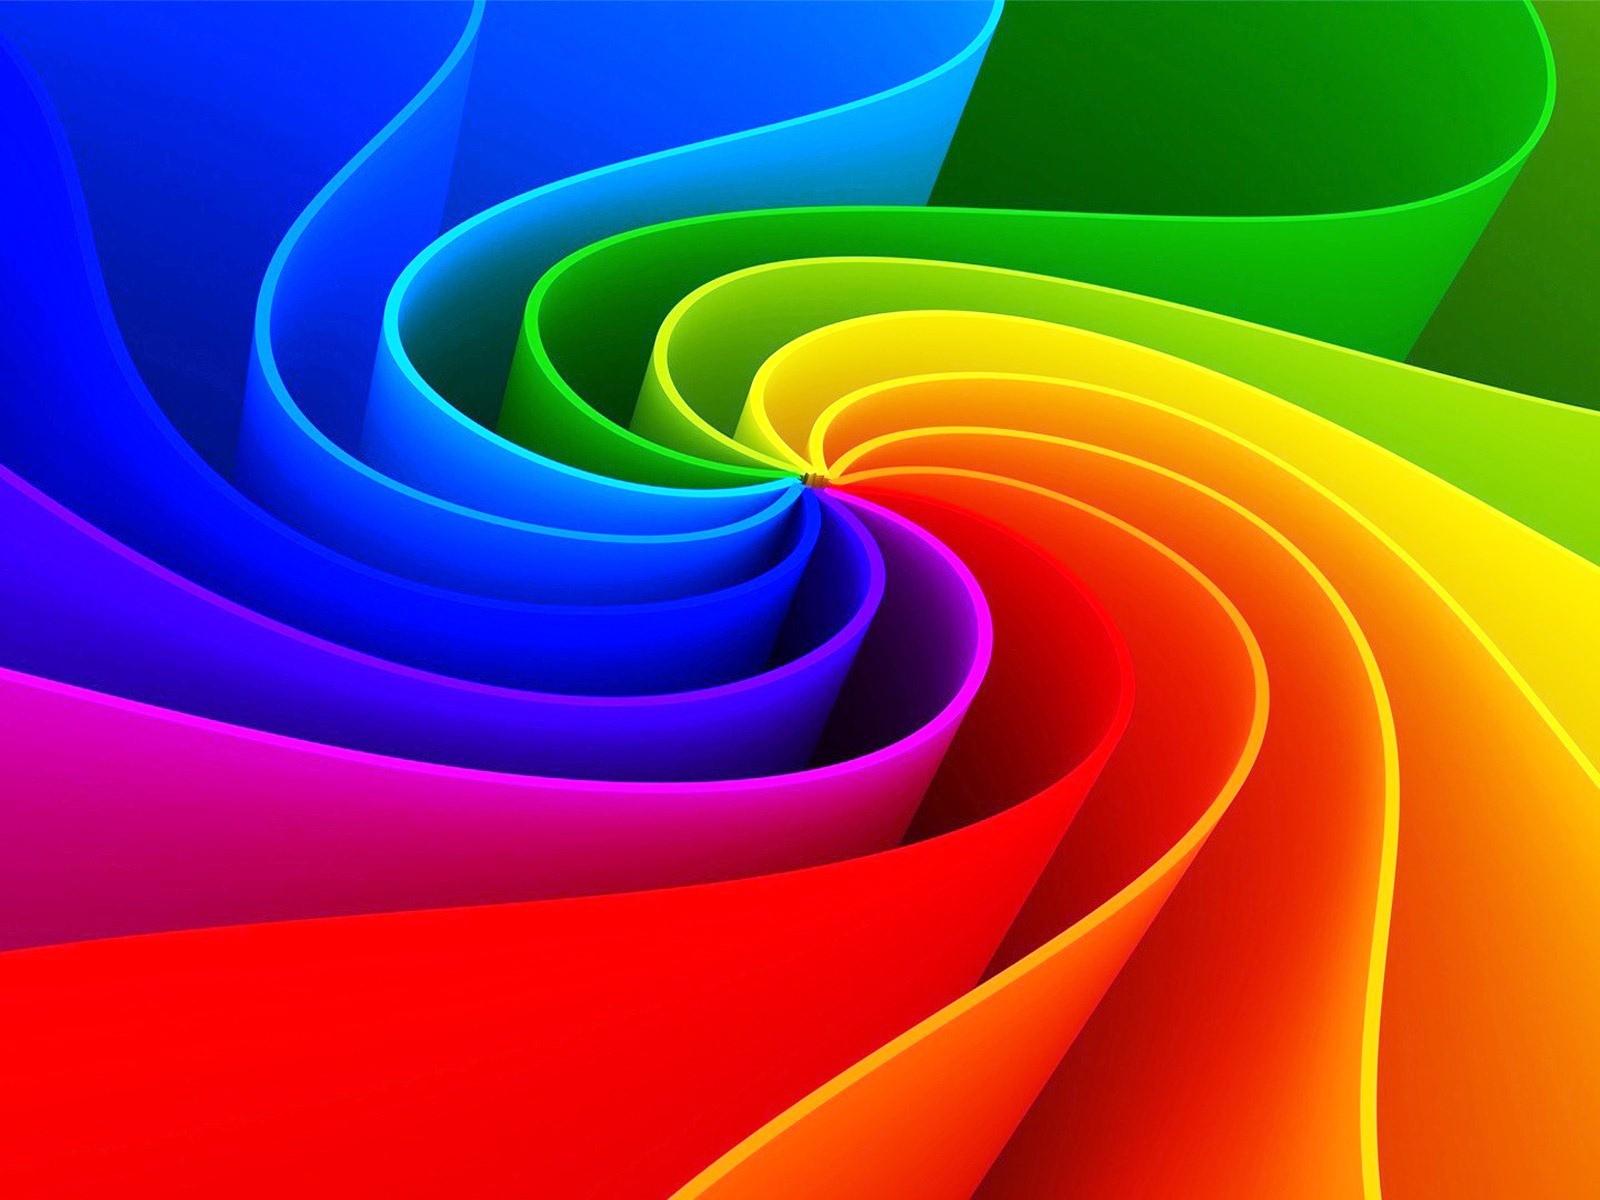 3D Dynamic Rainbow Wallpapers 4929 Wallpaper Cool Walldiskpapercom 1600x1200